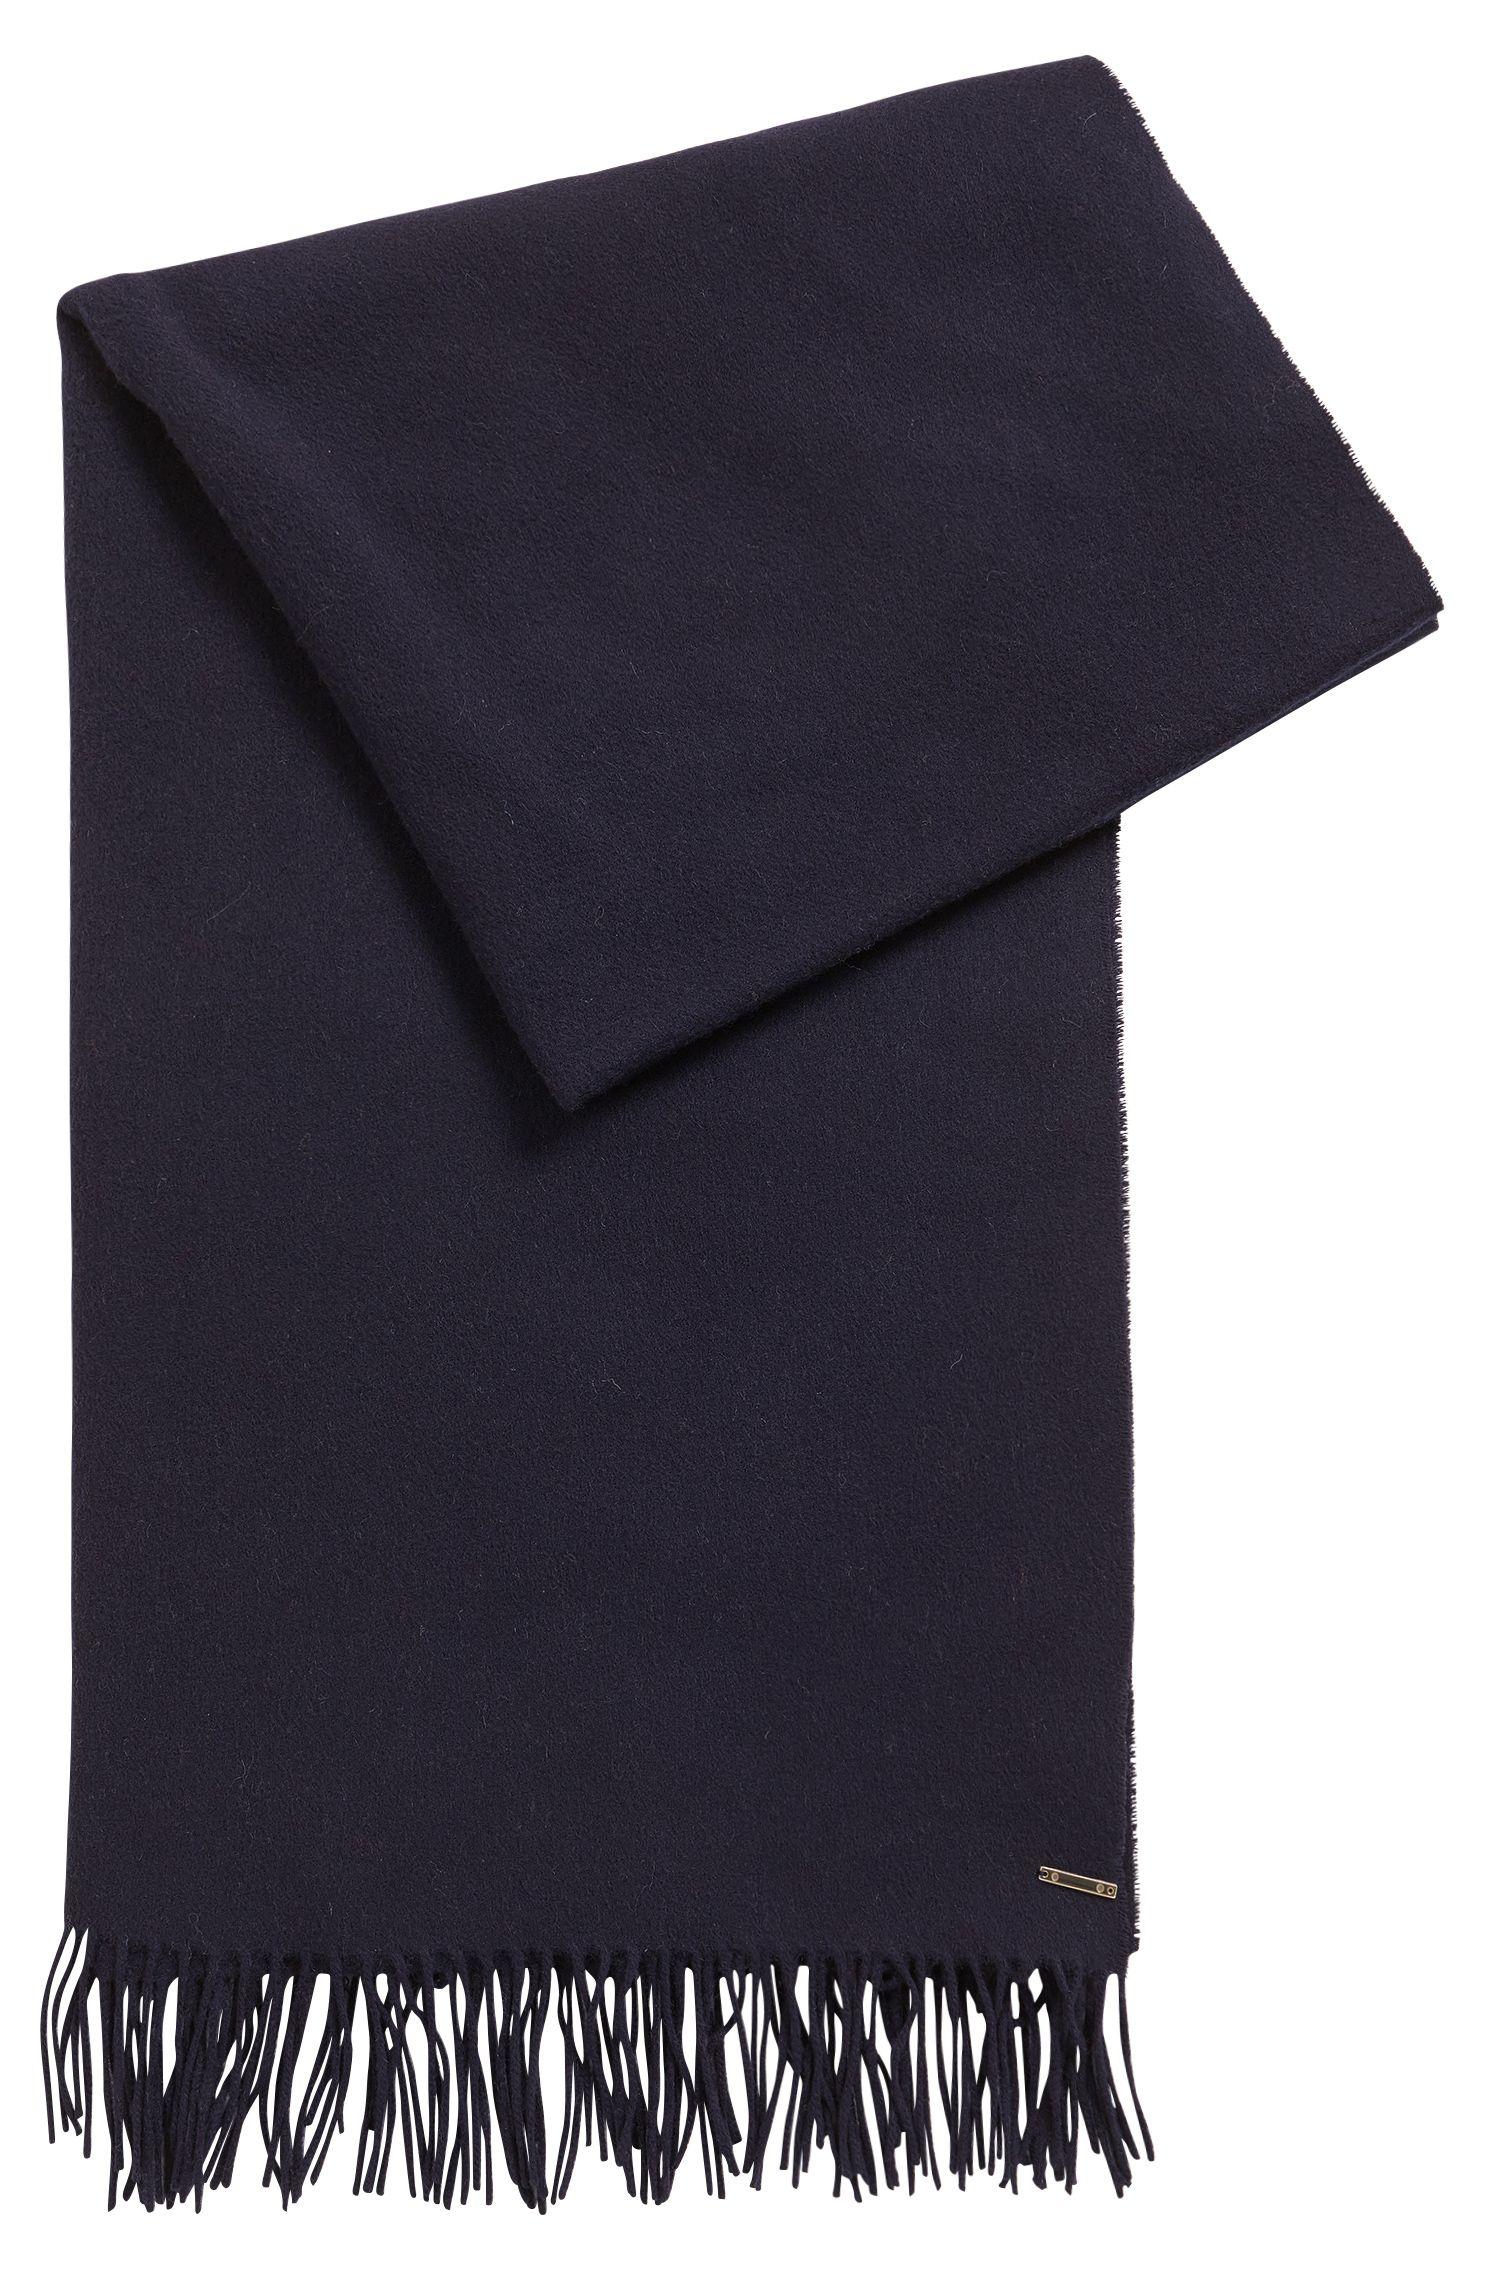 Virgin wool-mix scarf with metallic logo